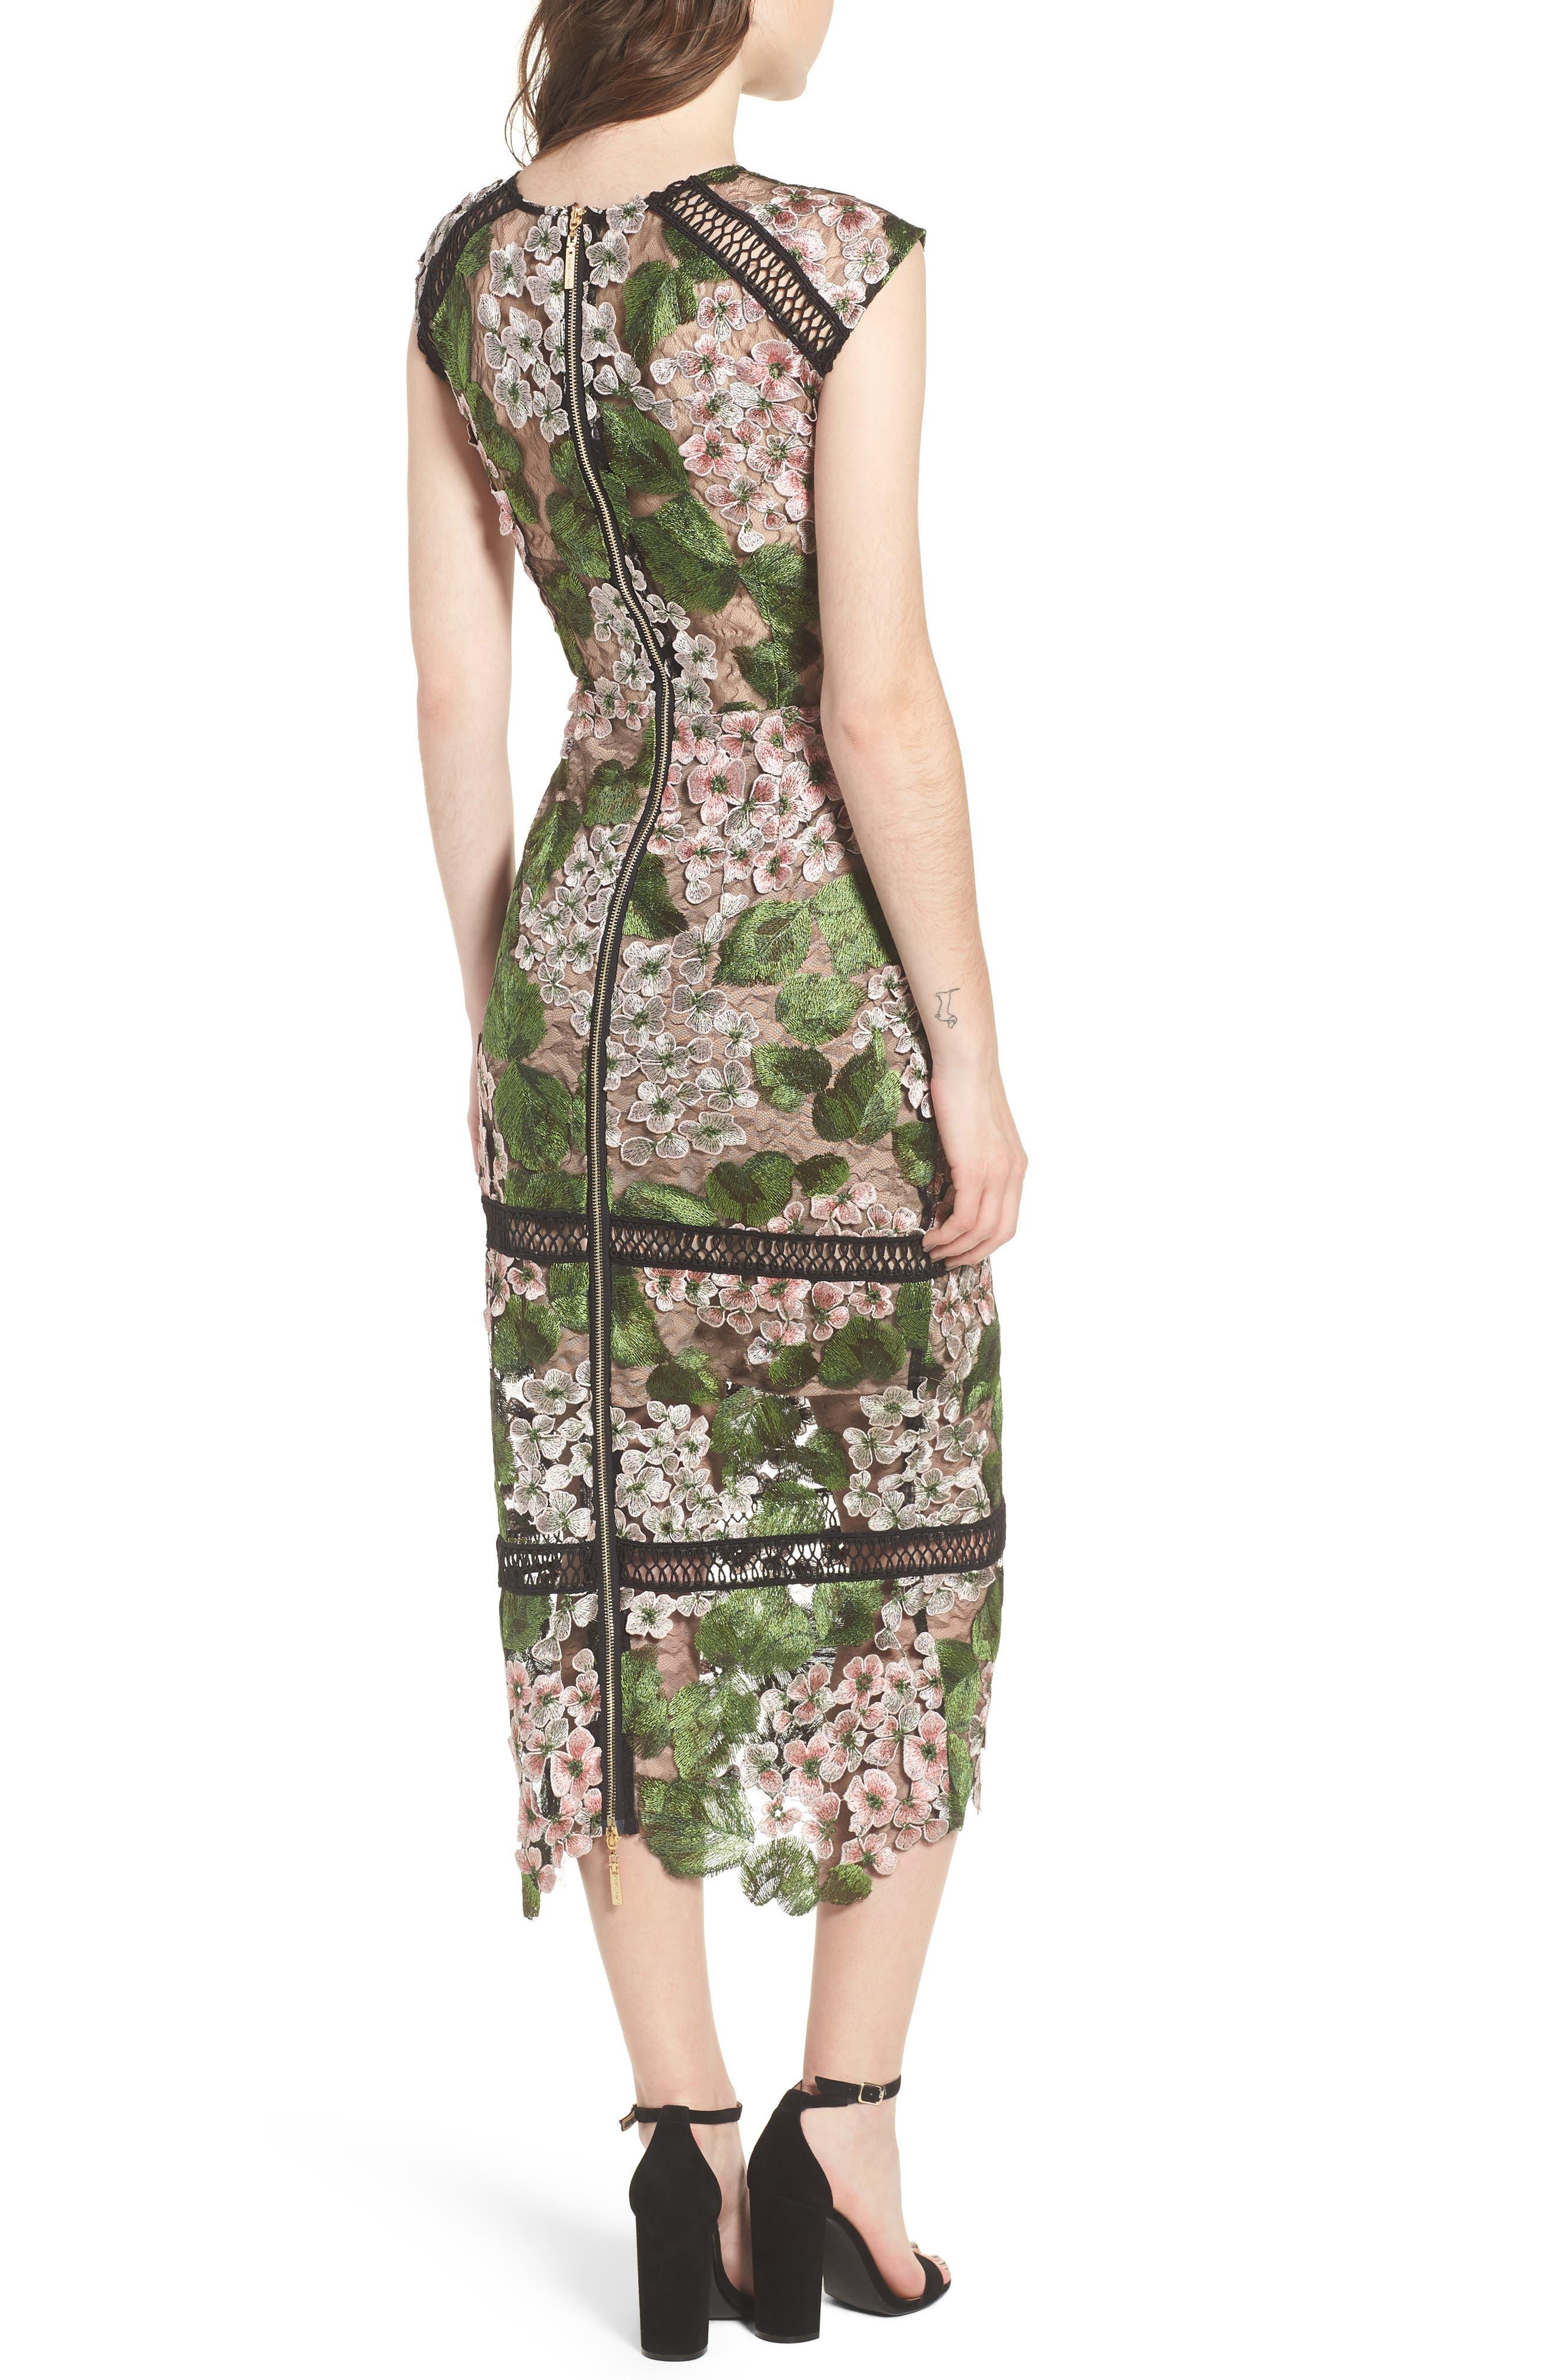 Cherry Hydrangea Lace Dress,                             Alternate thumbnail 2, color,                             Multicolor Pink